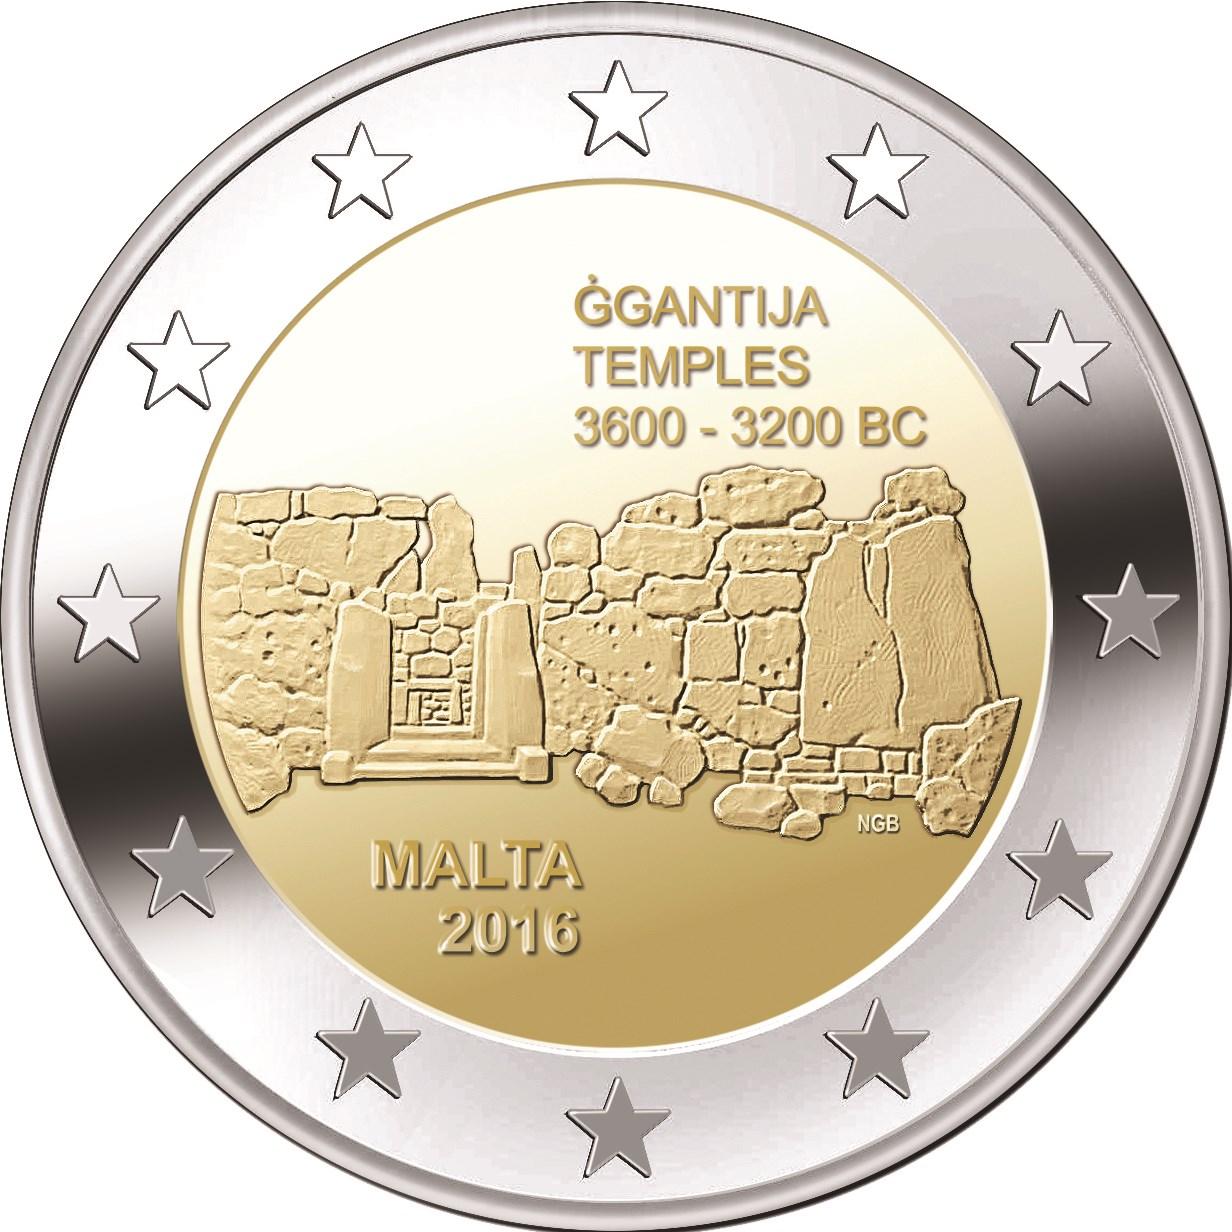 2 Euro Malta 2016 Ggantija Graf Waldschratde In Unserem Euro